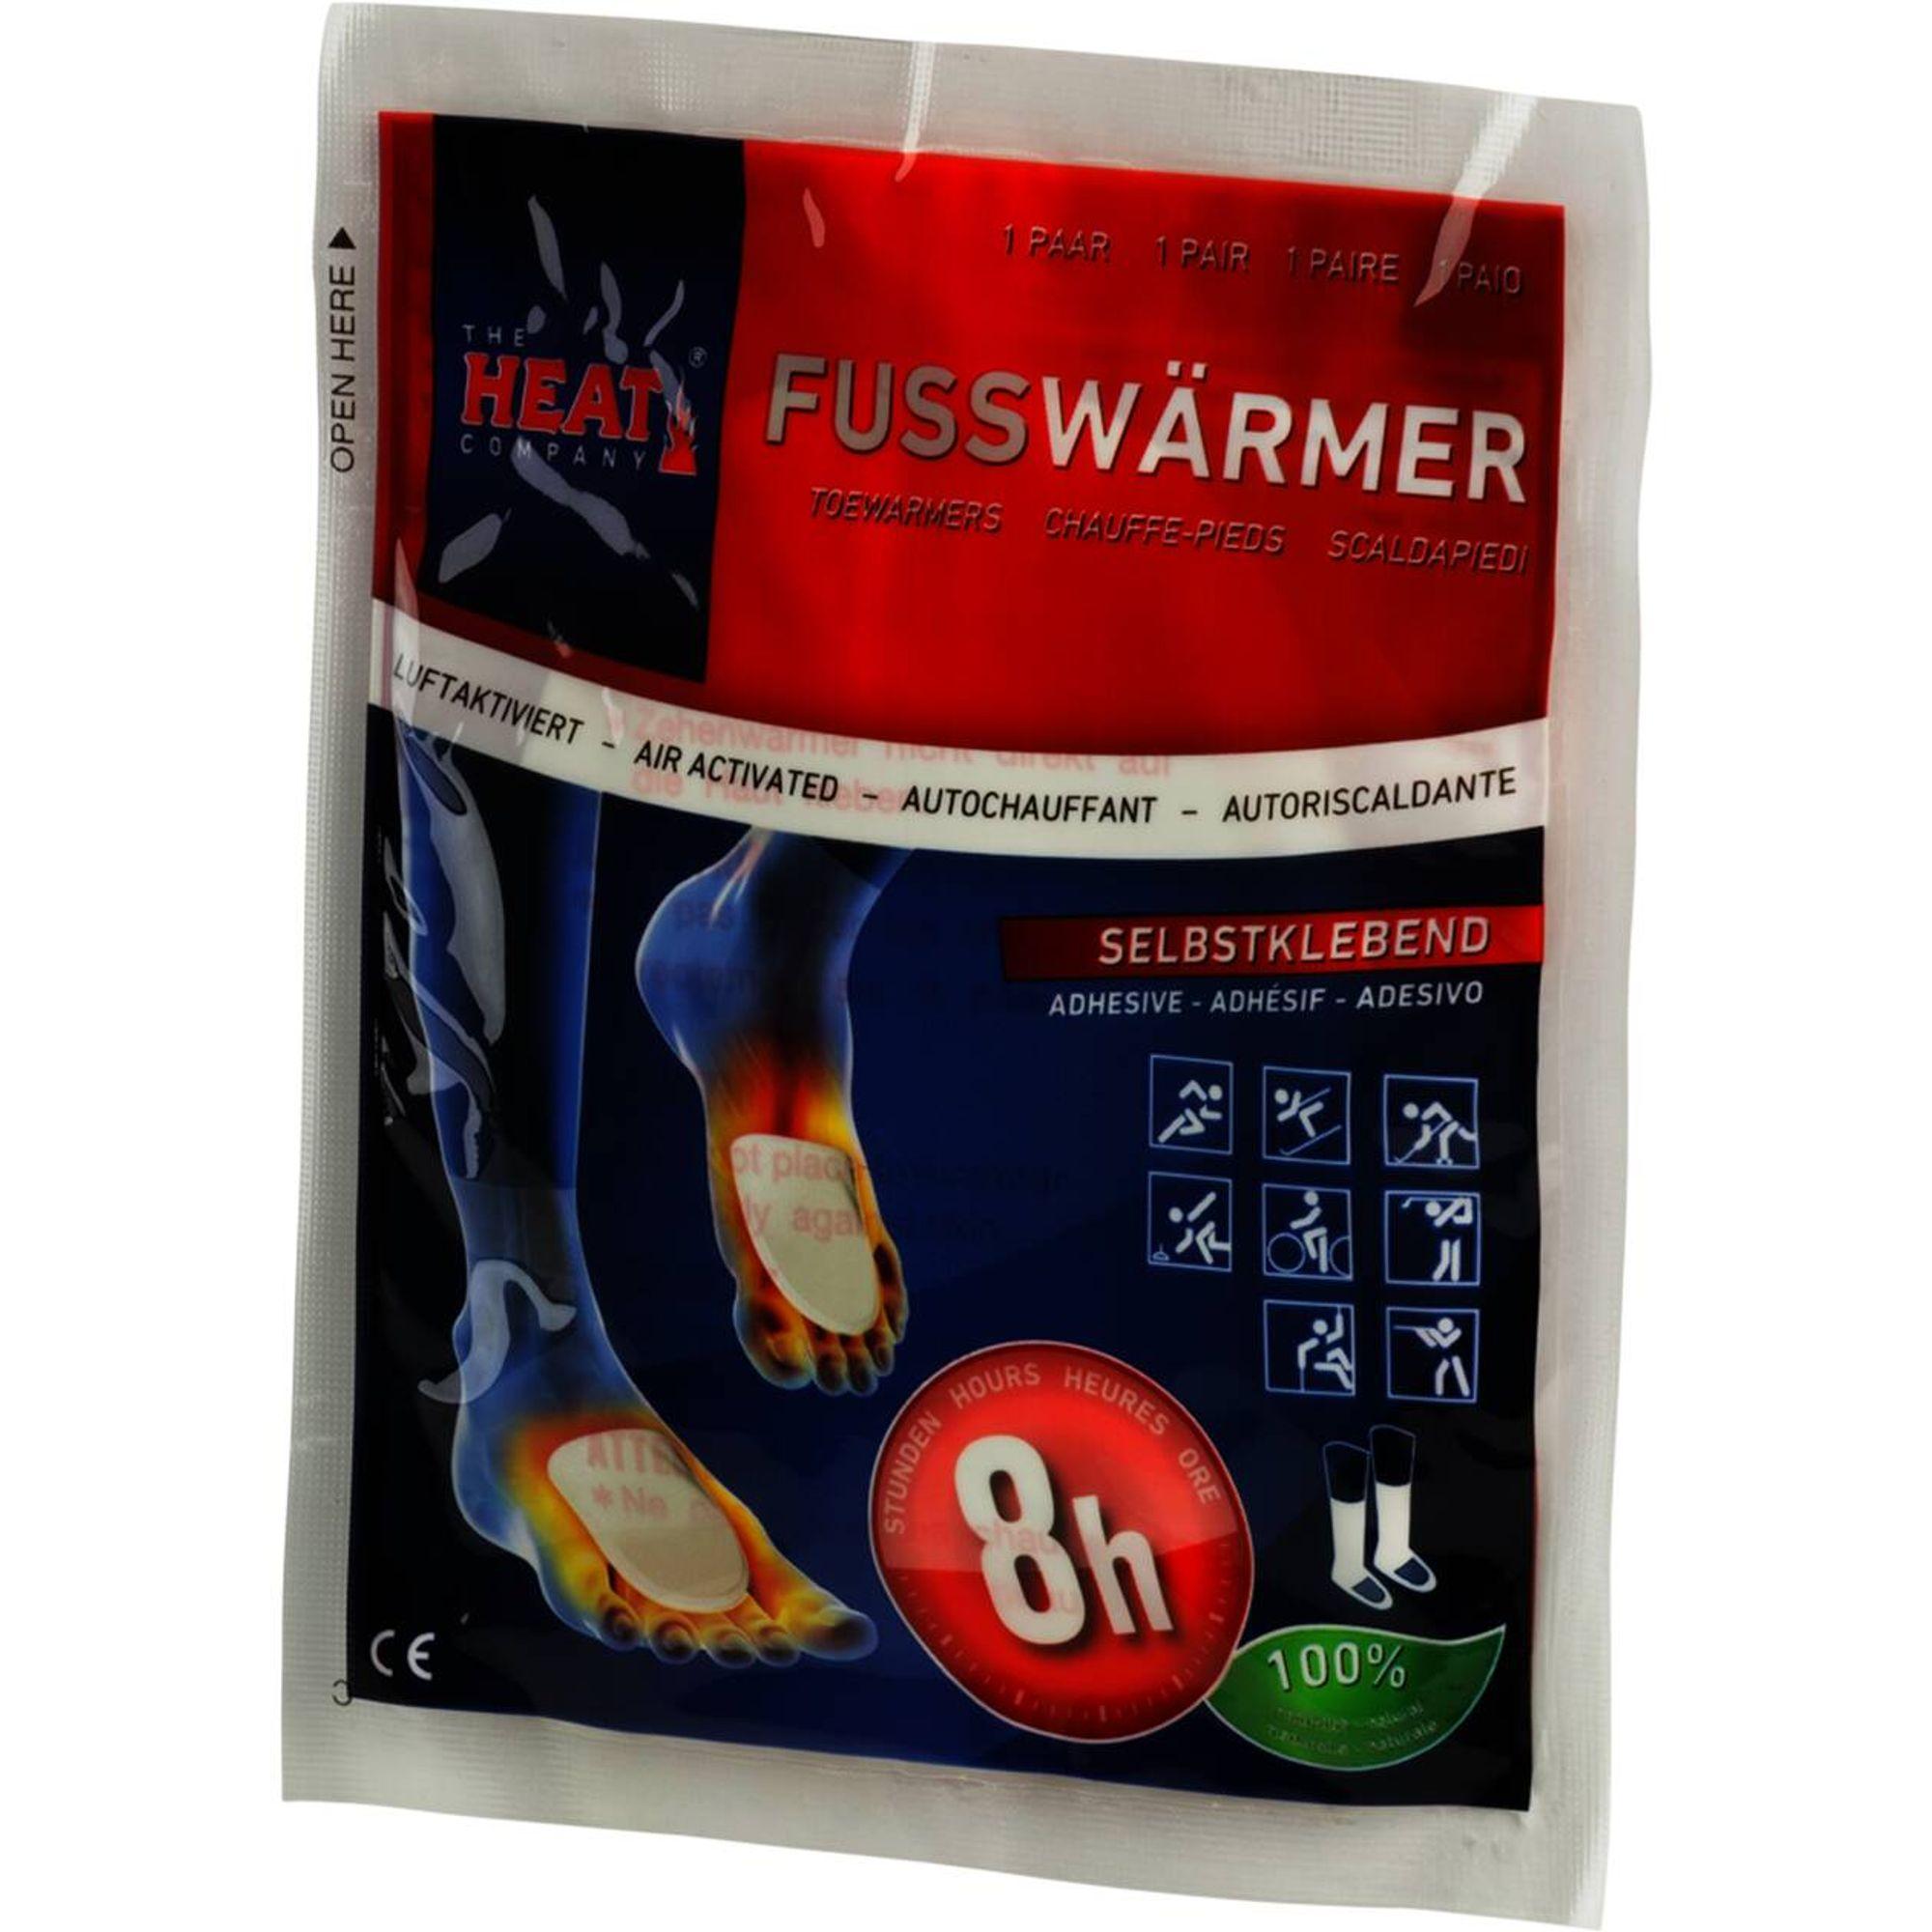 The Heat Company Fußwärmer 3Er Pack - neutral